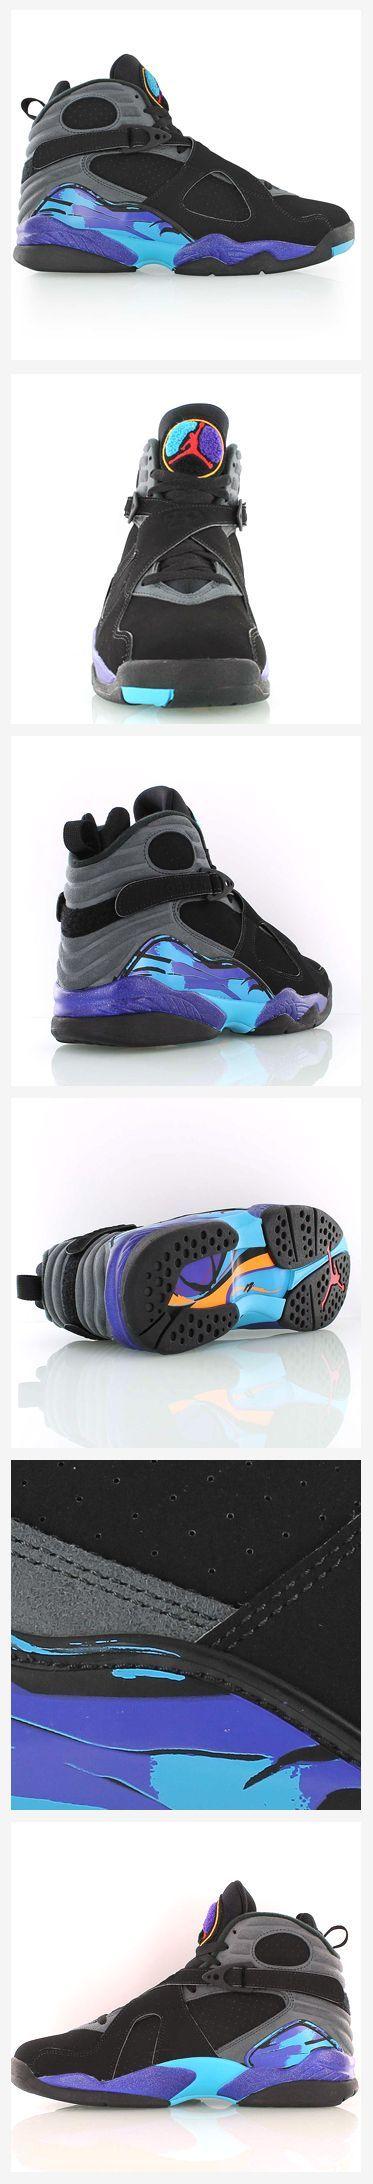 Best 25+ Jordan tennis shoes ideas on Pinterest | Womens jordans ...